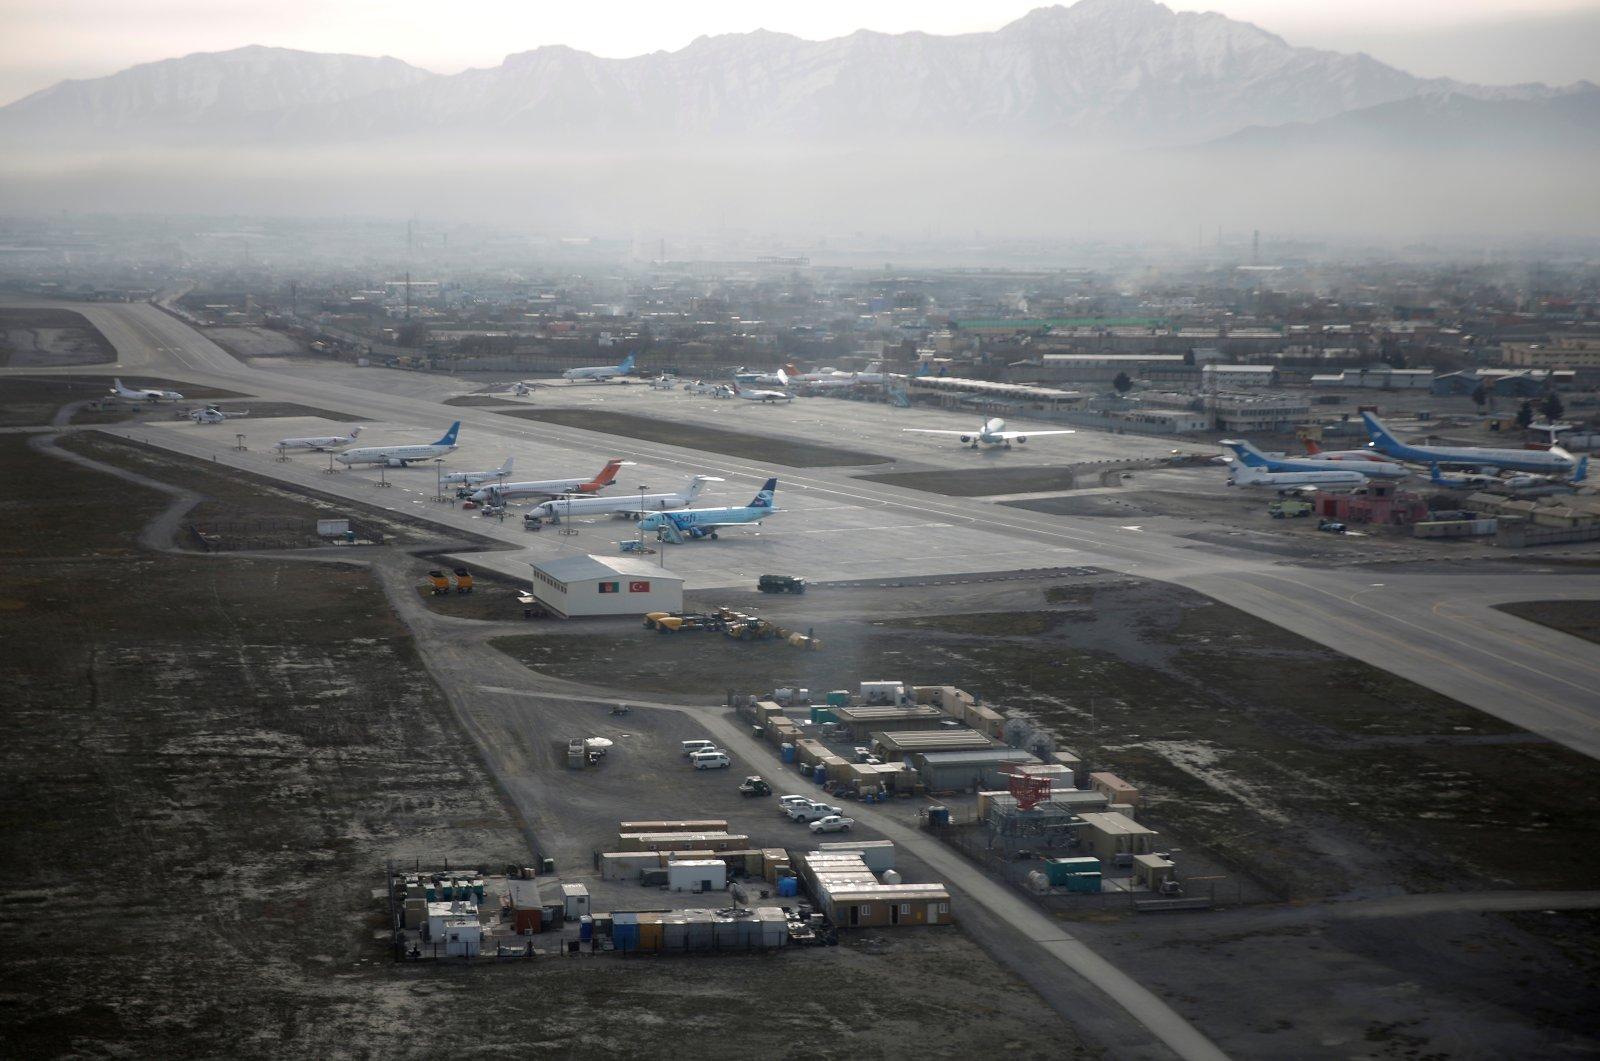 Hamid Karzai International Airport in Kabul, previously known as Kabul International Airport, in Afghanistan, February 11, 2016. (Reuters Photo)